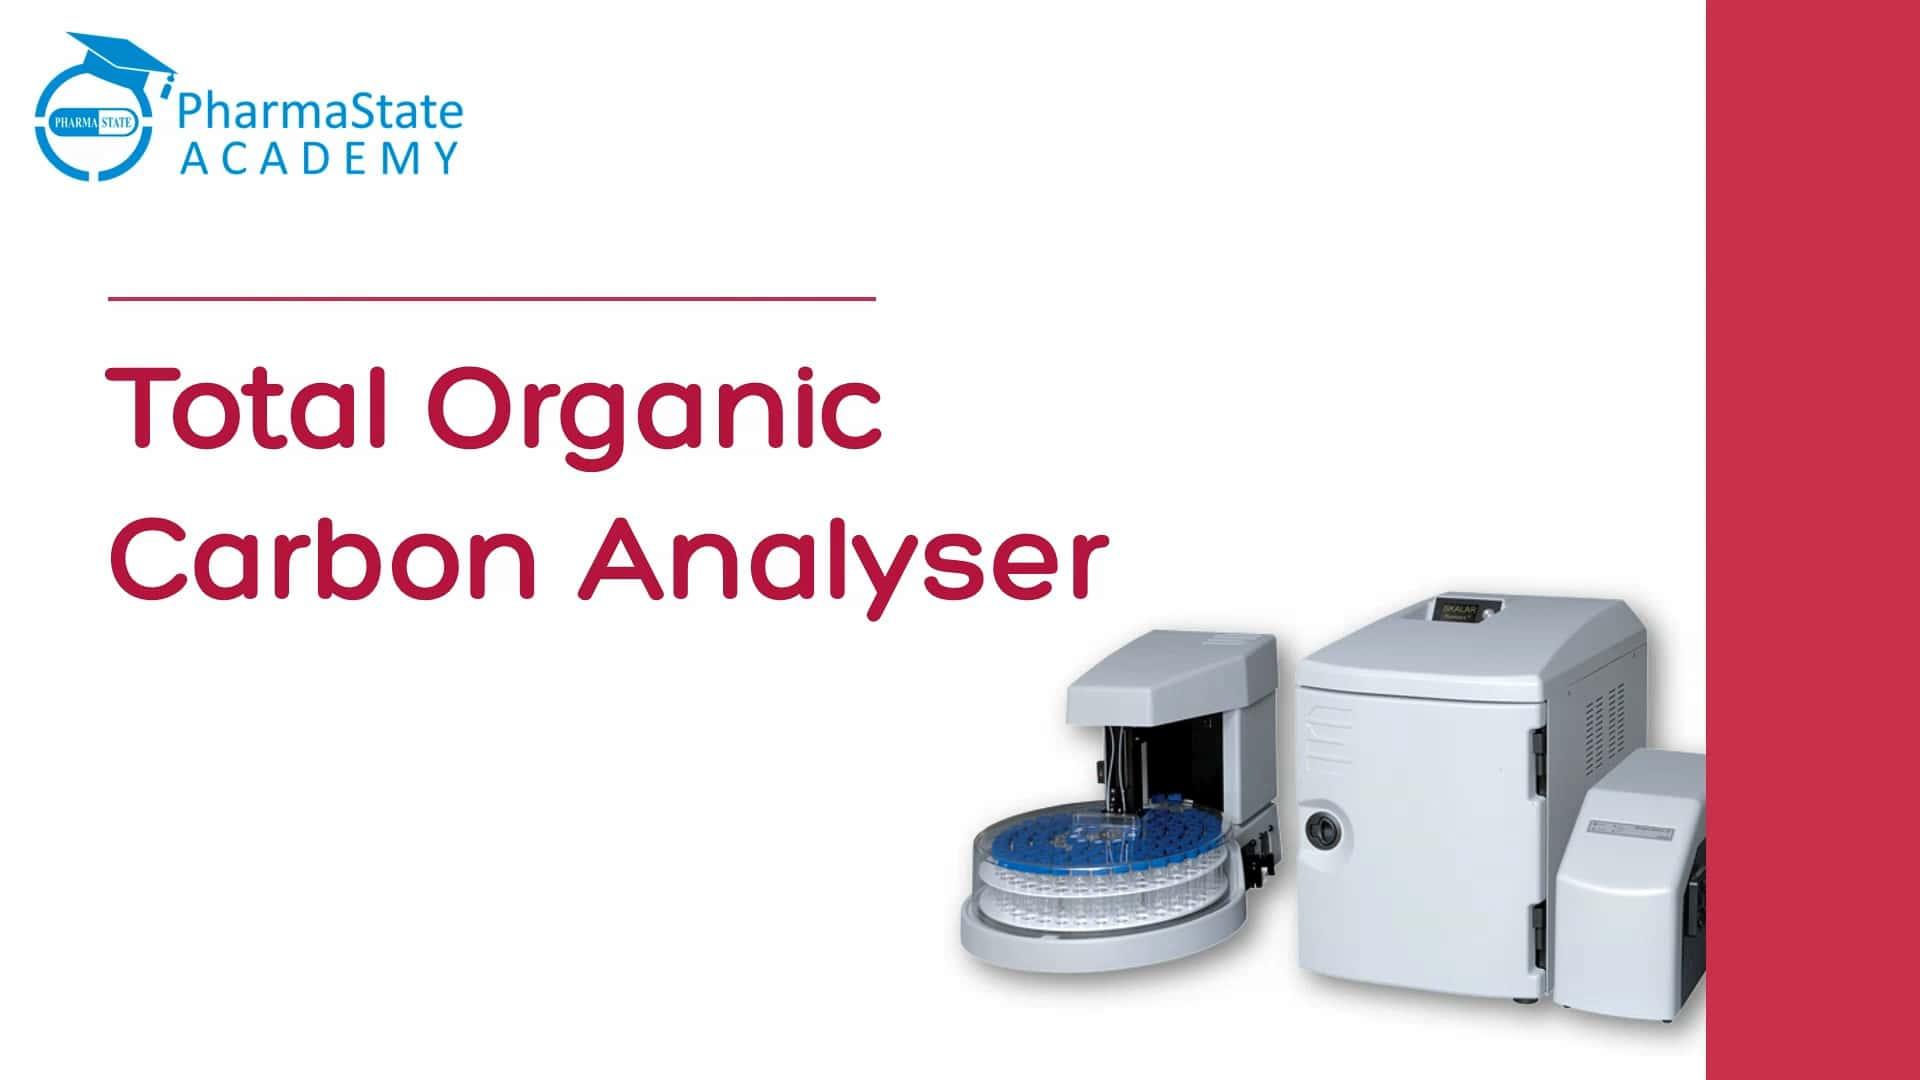 Total organic carbon analyser